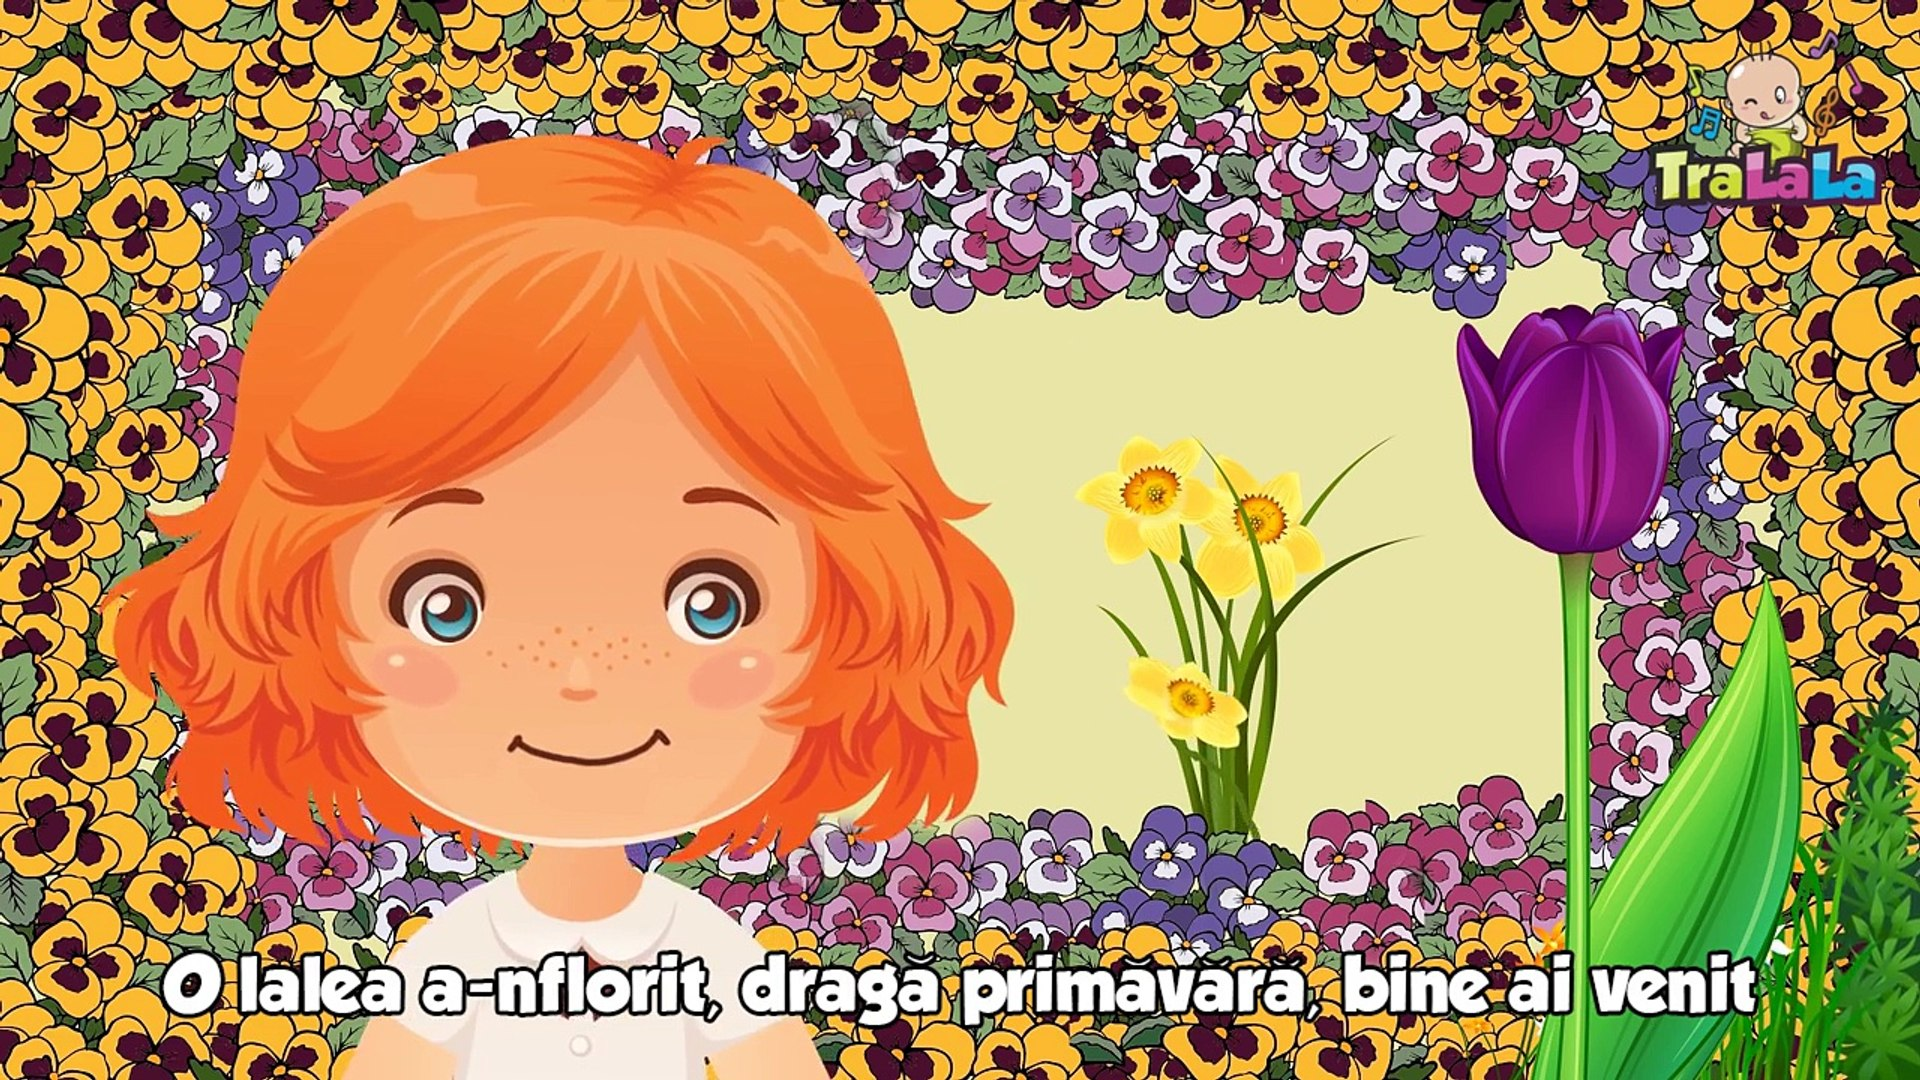 Flori De Primavara Tralala Dailymotion Video